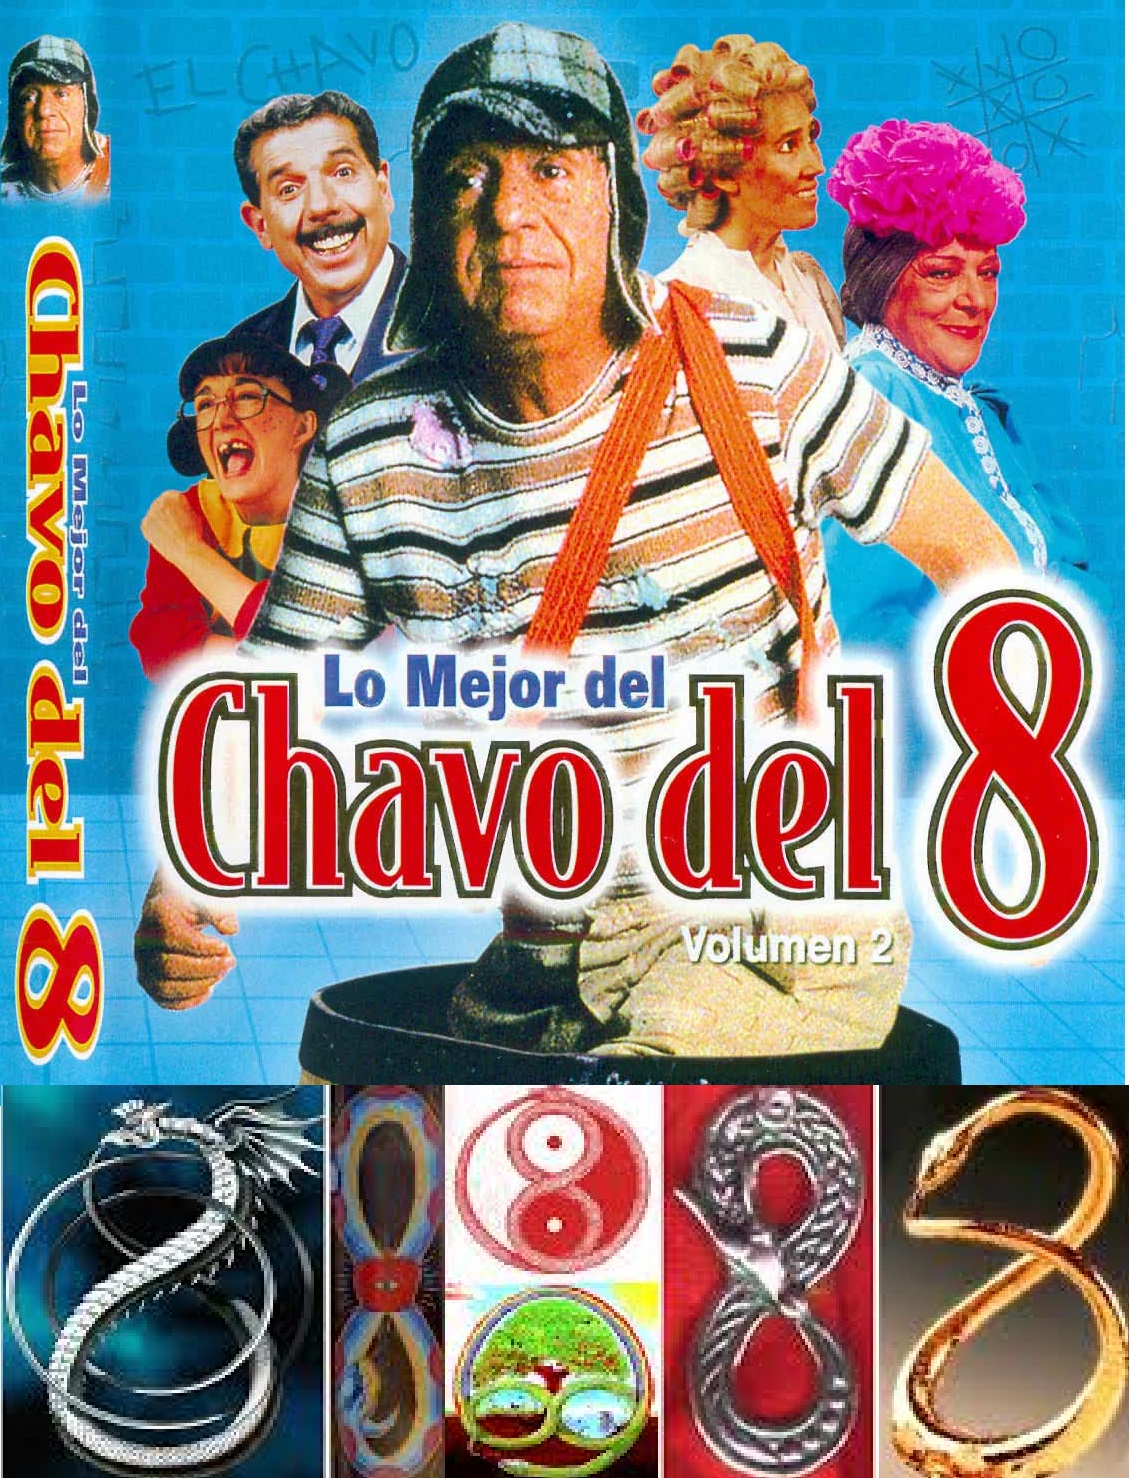 chavo_Del_8_